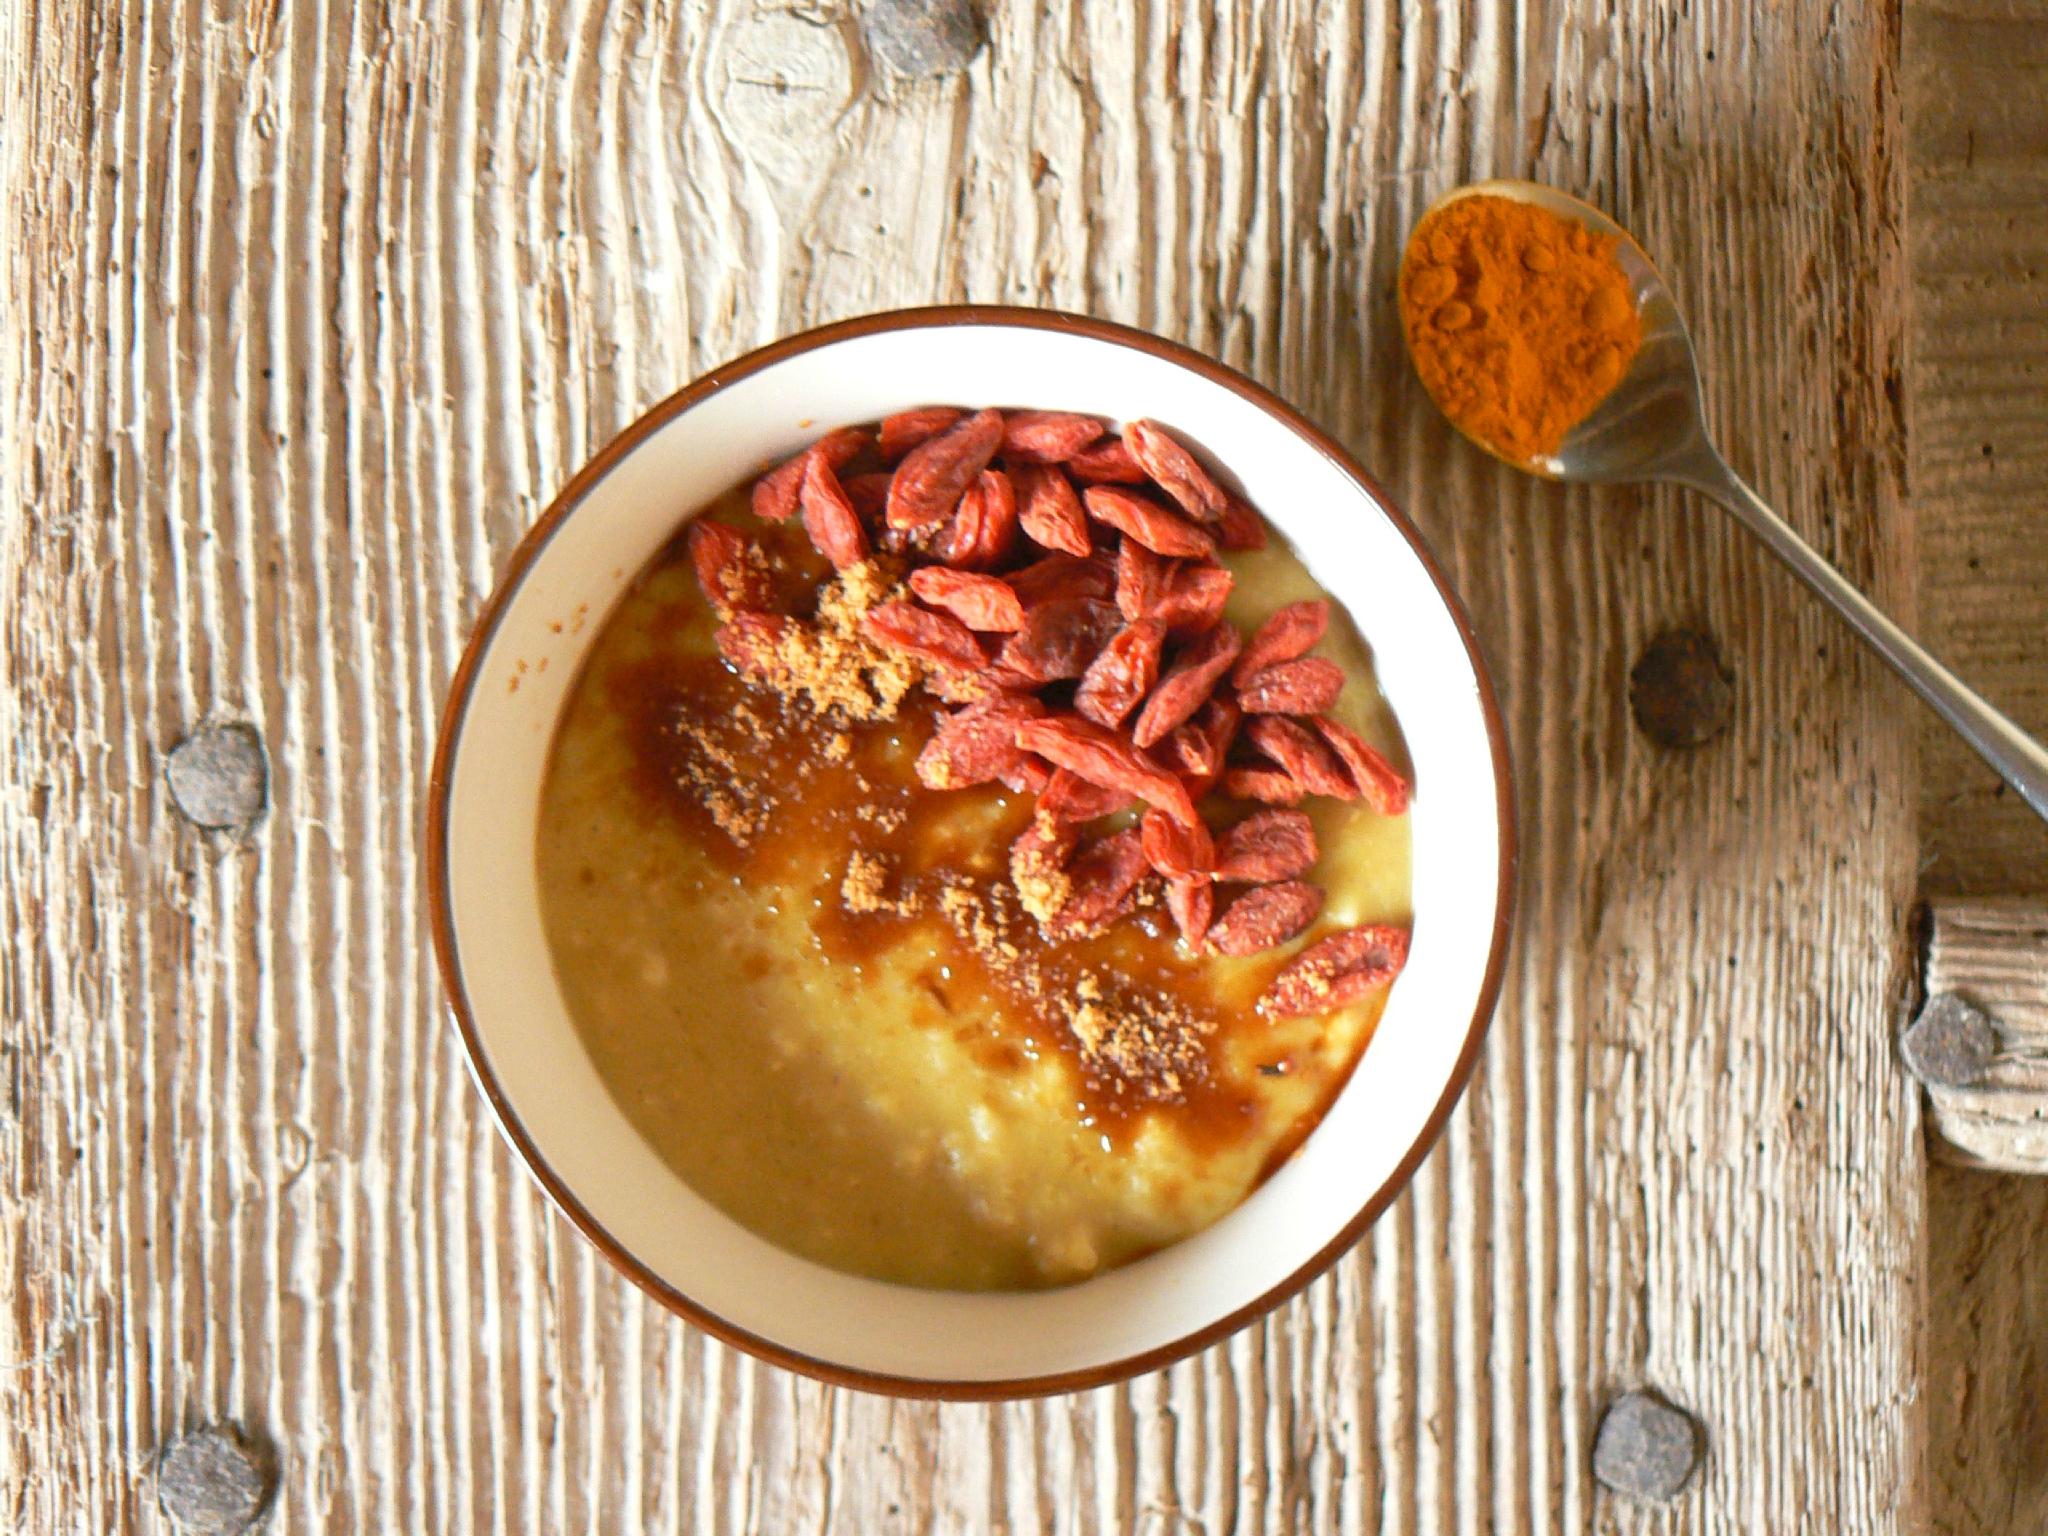 Petit-déjeuner protéiné au curcuma et baies de Goji